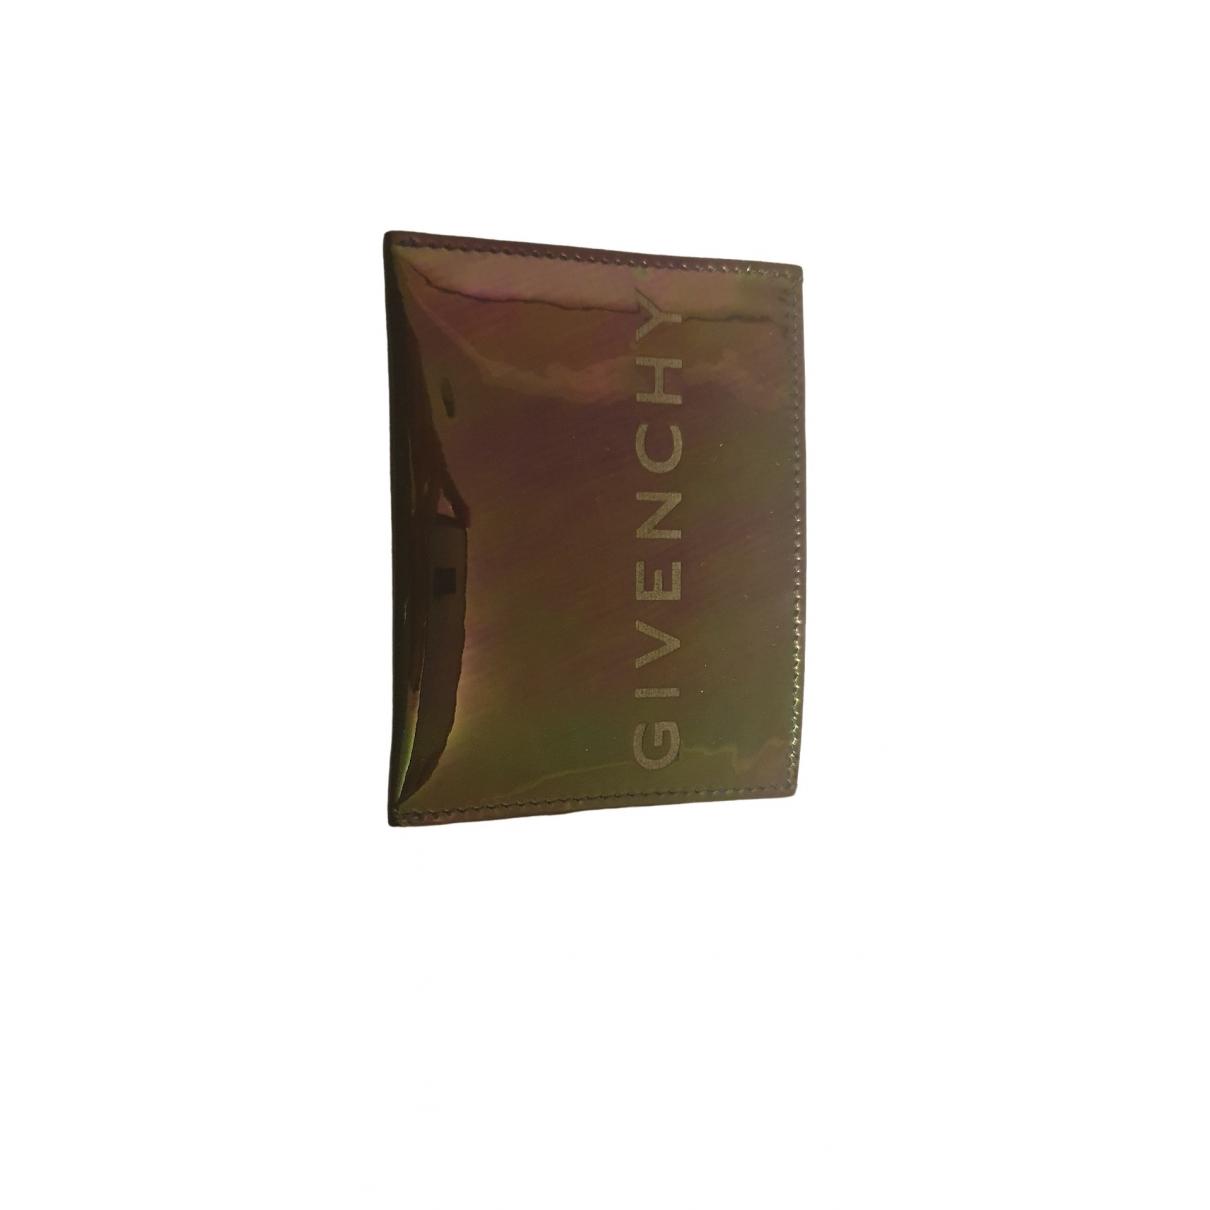 Givenchy \N Kleinlederwaren in  Lila Lackleder